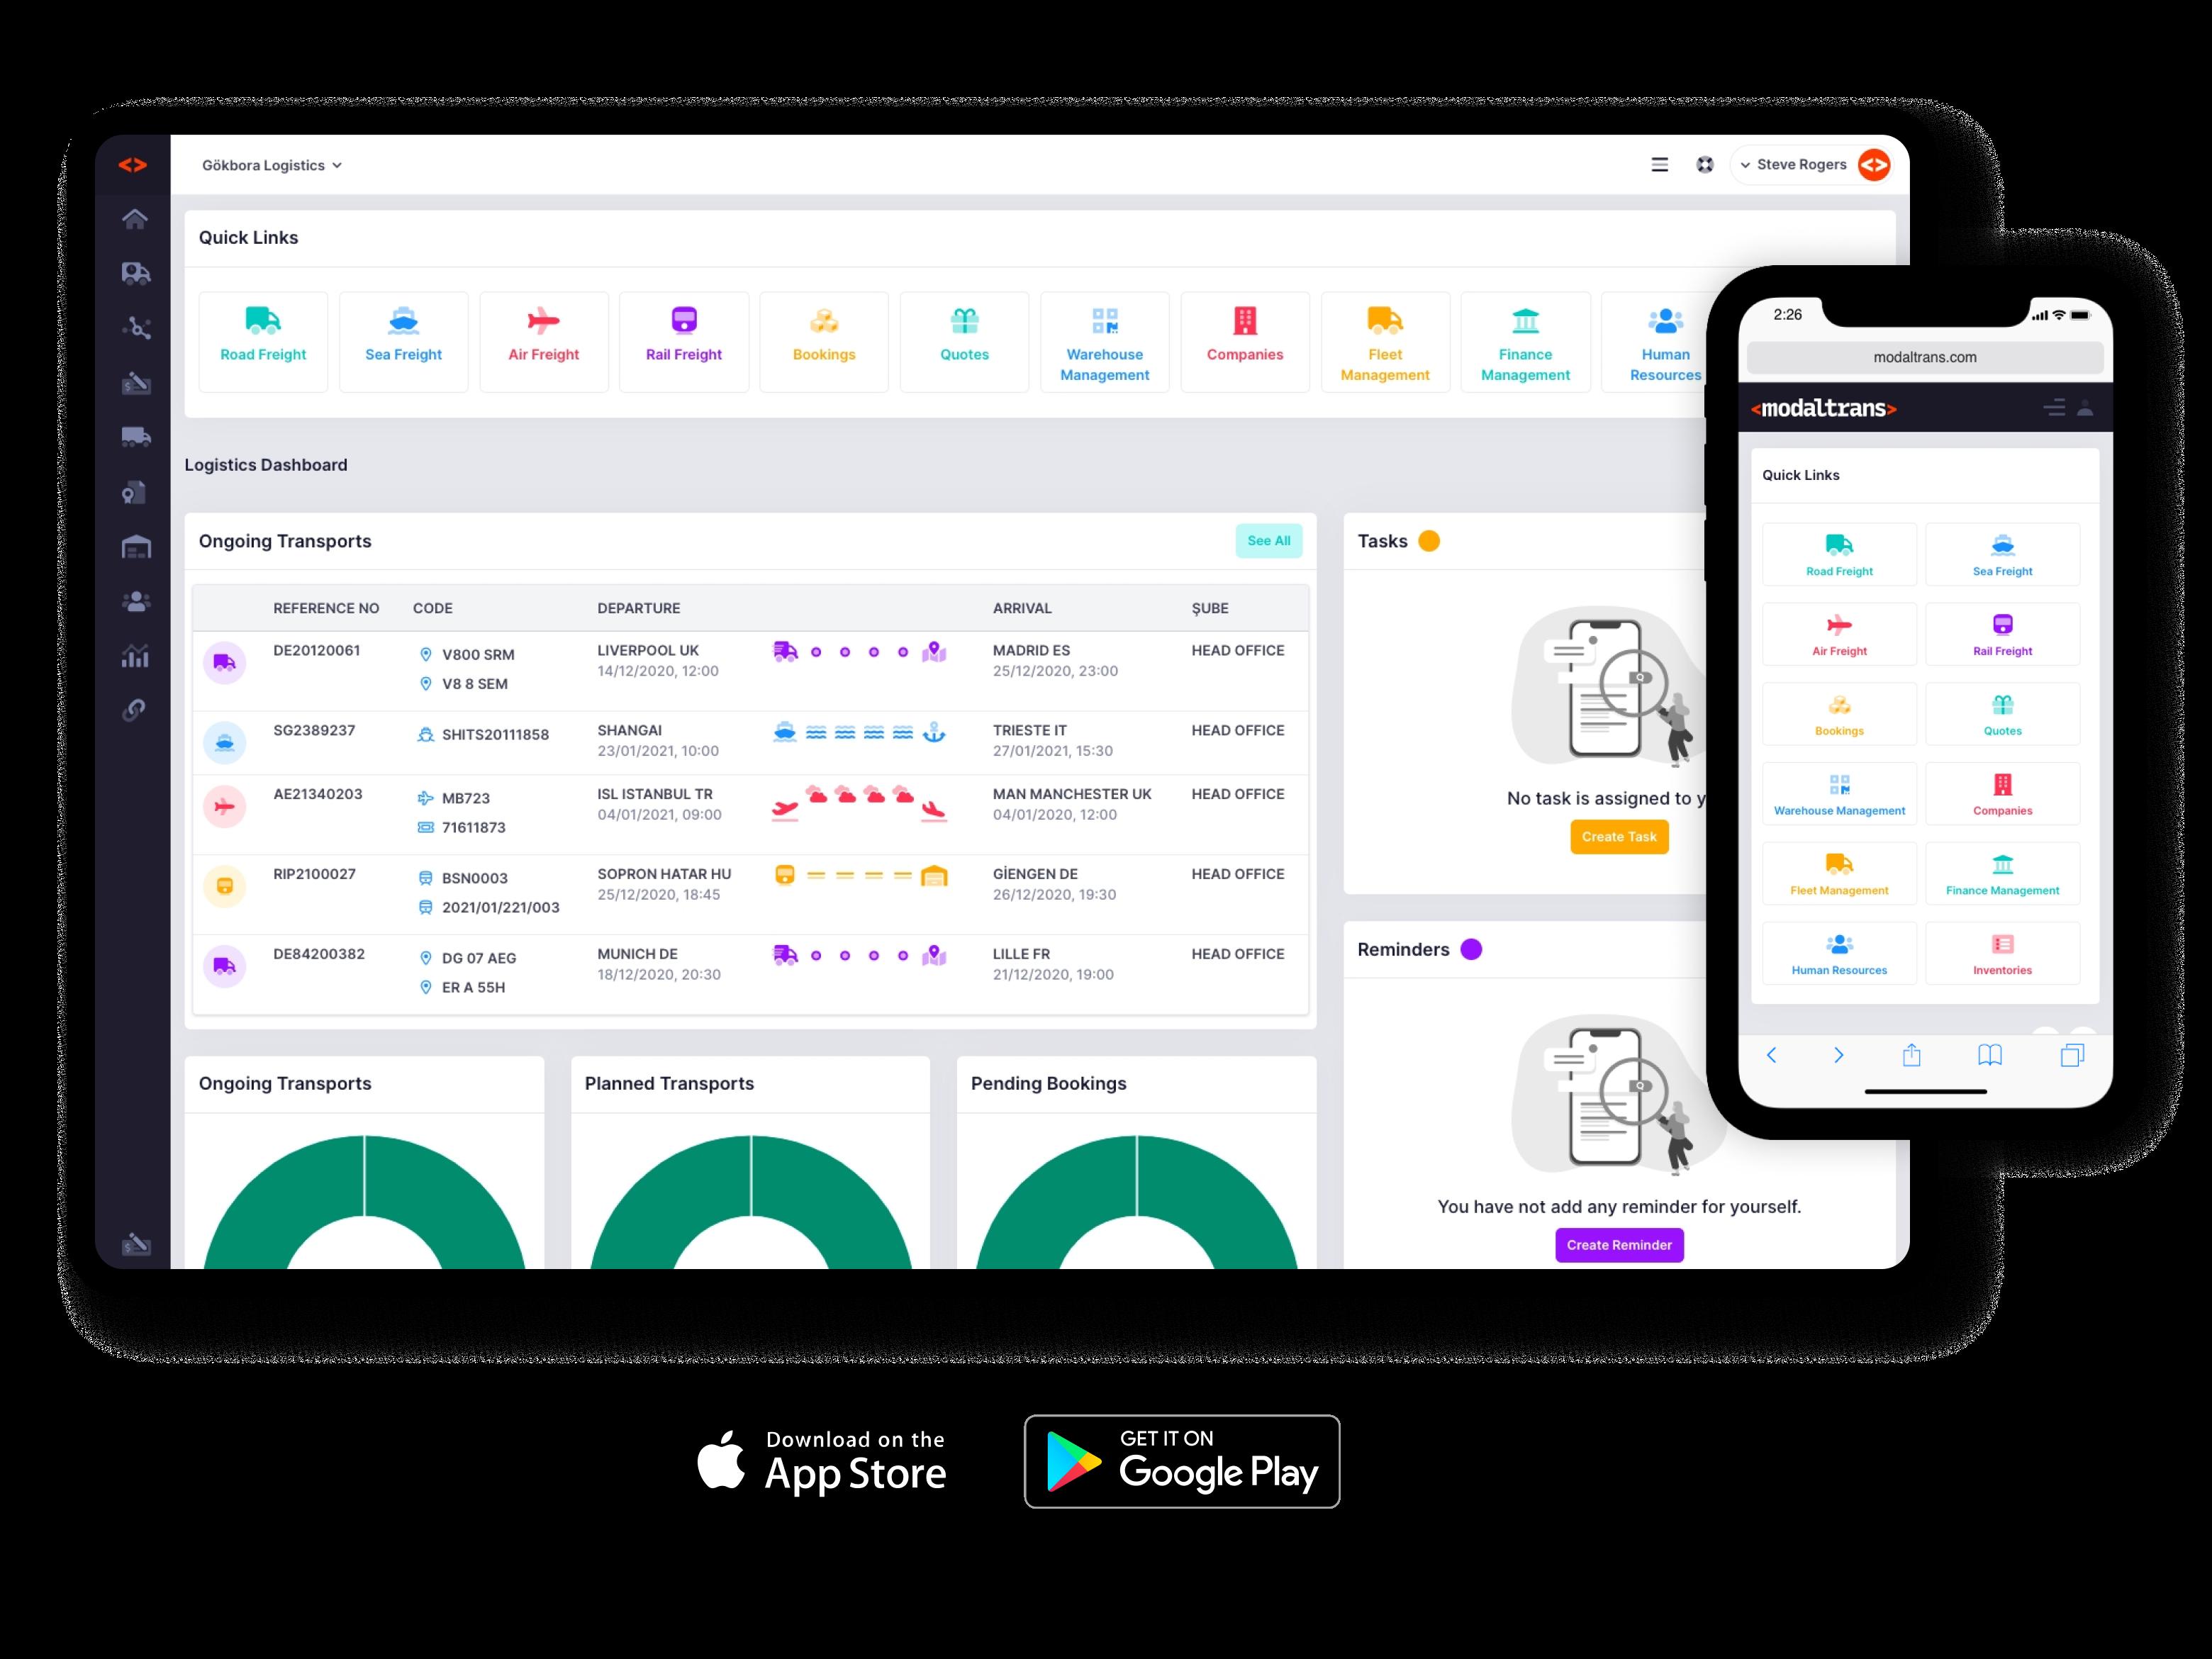 Modaltrans works on every mobile, desktop device